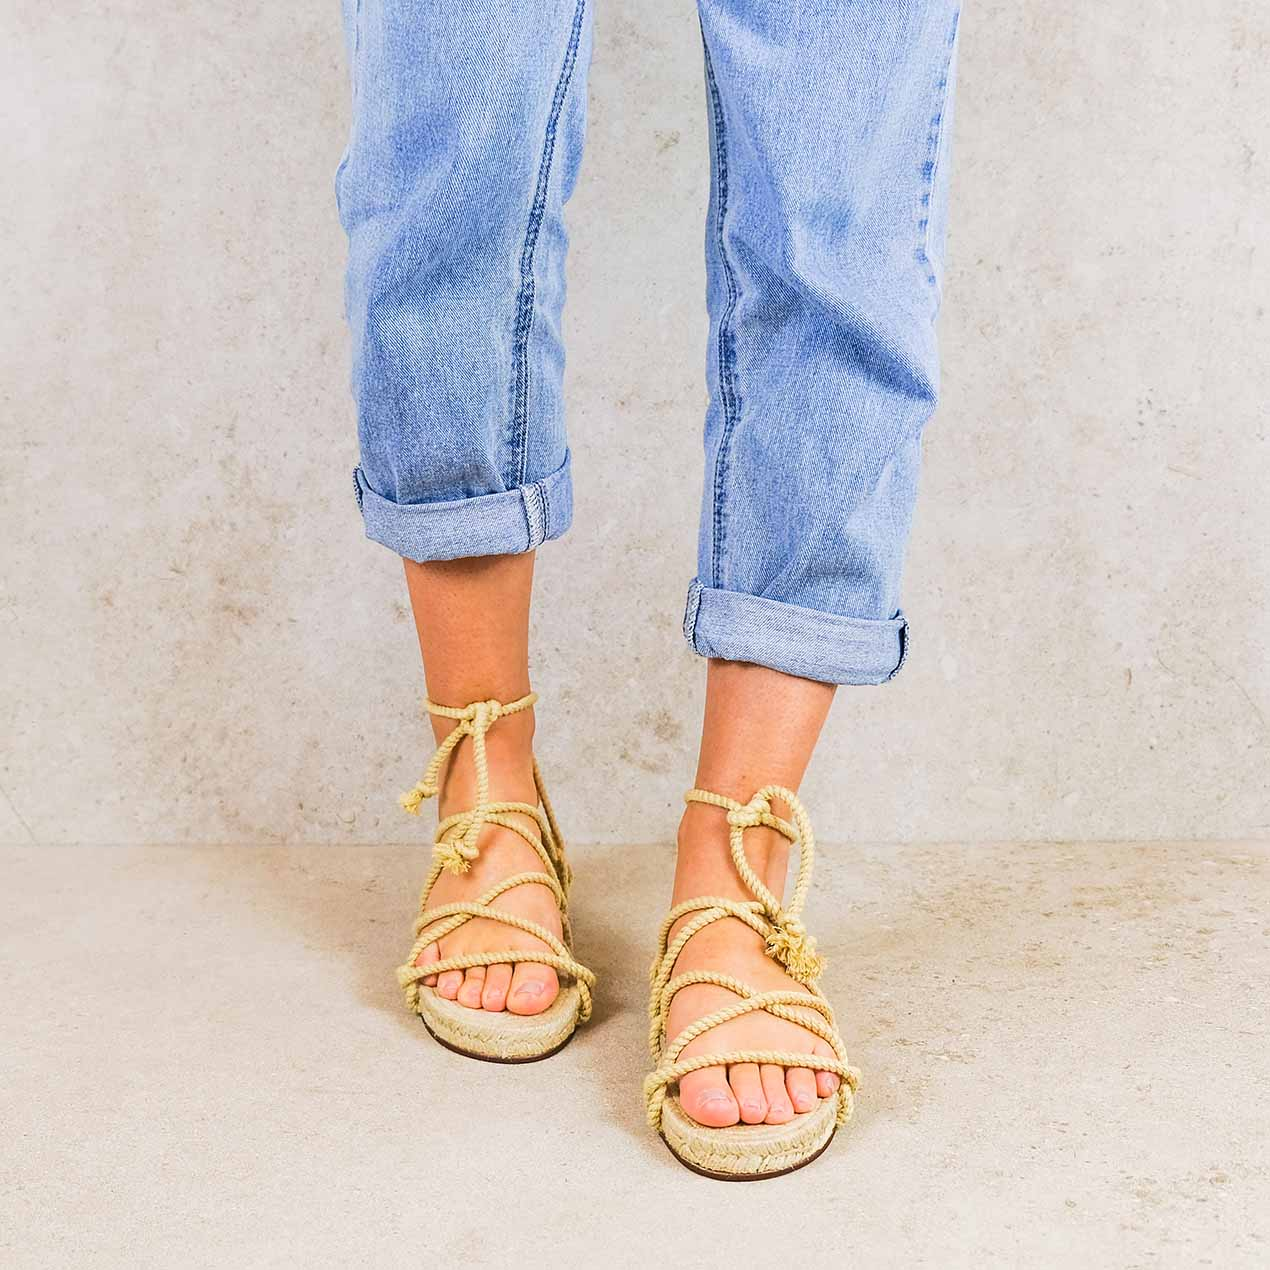 Cruz-low_lintsandalen sandals travelsandals vegan sustainable sandals wikkelsandalen